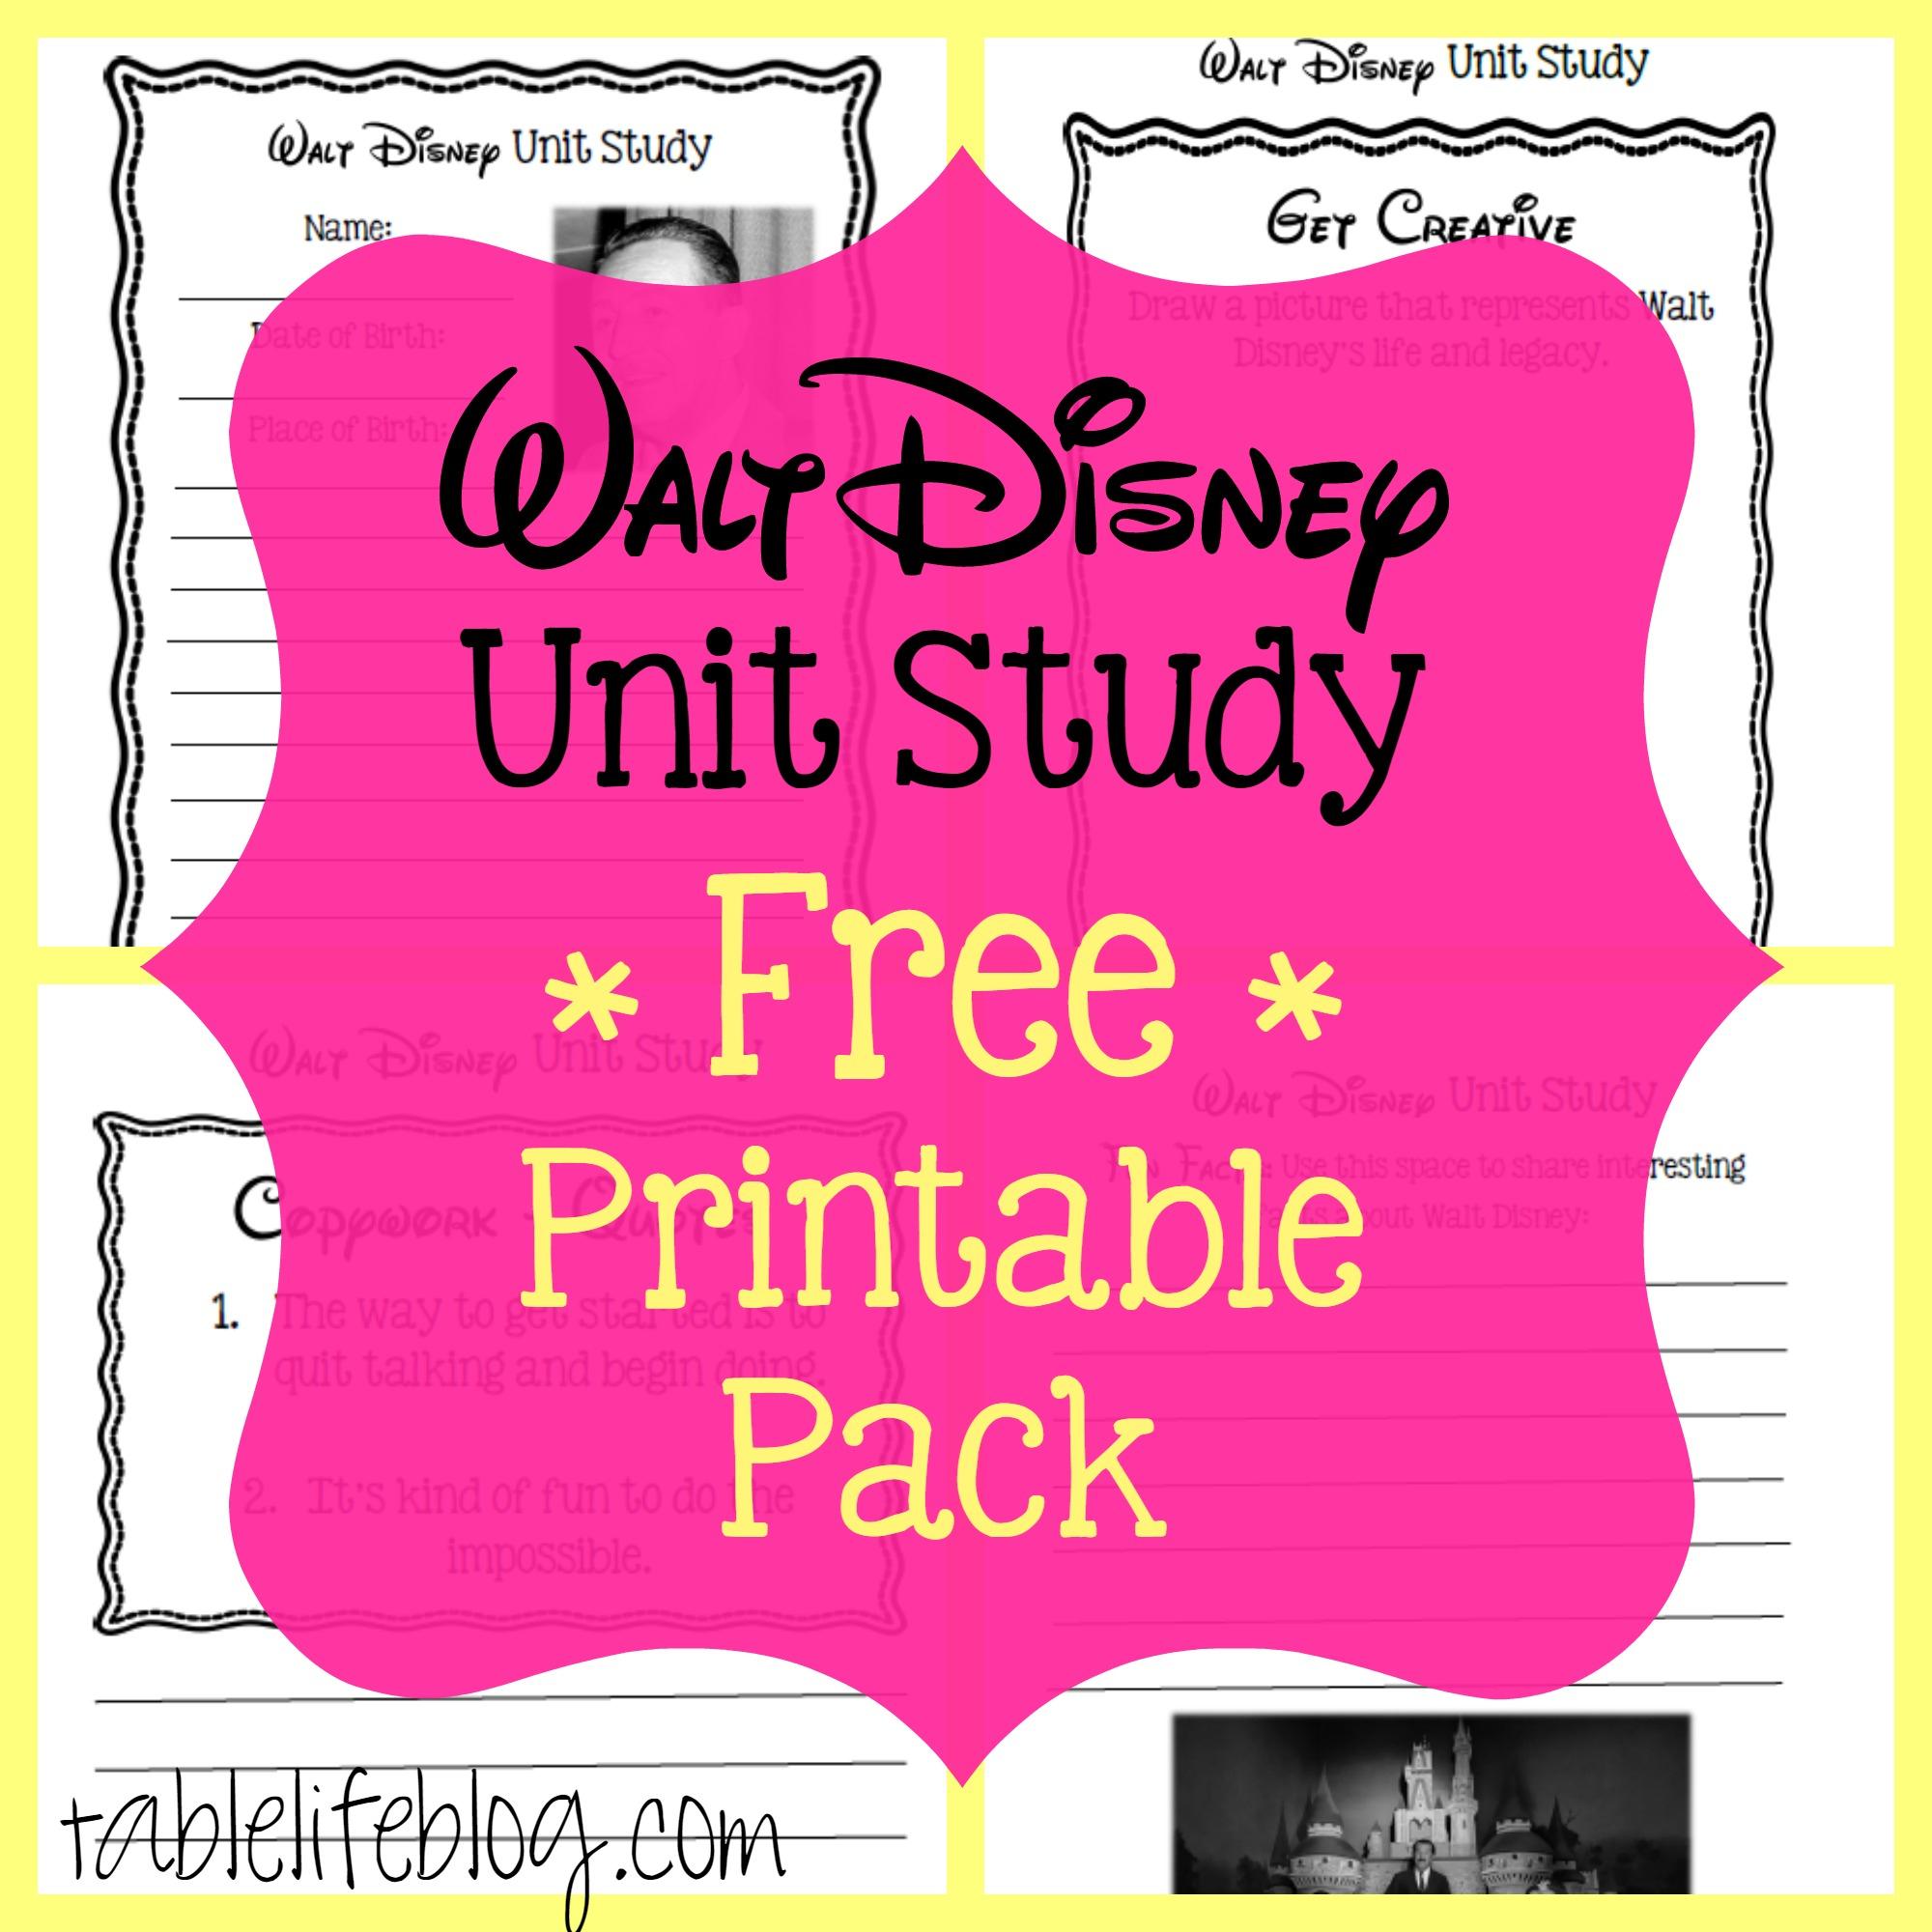 Free Printable Disney Stories Walt Disney Printable Pack Image - Free Printable Disney Stories